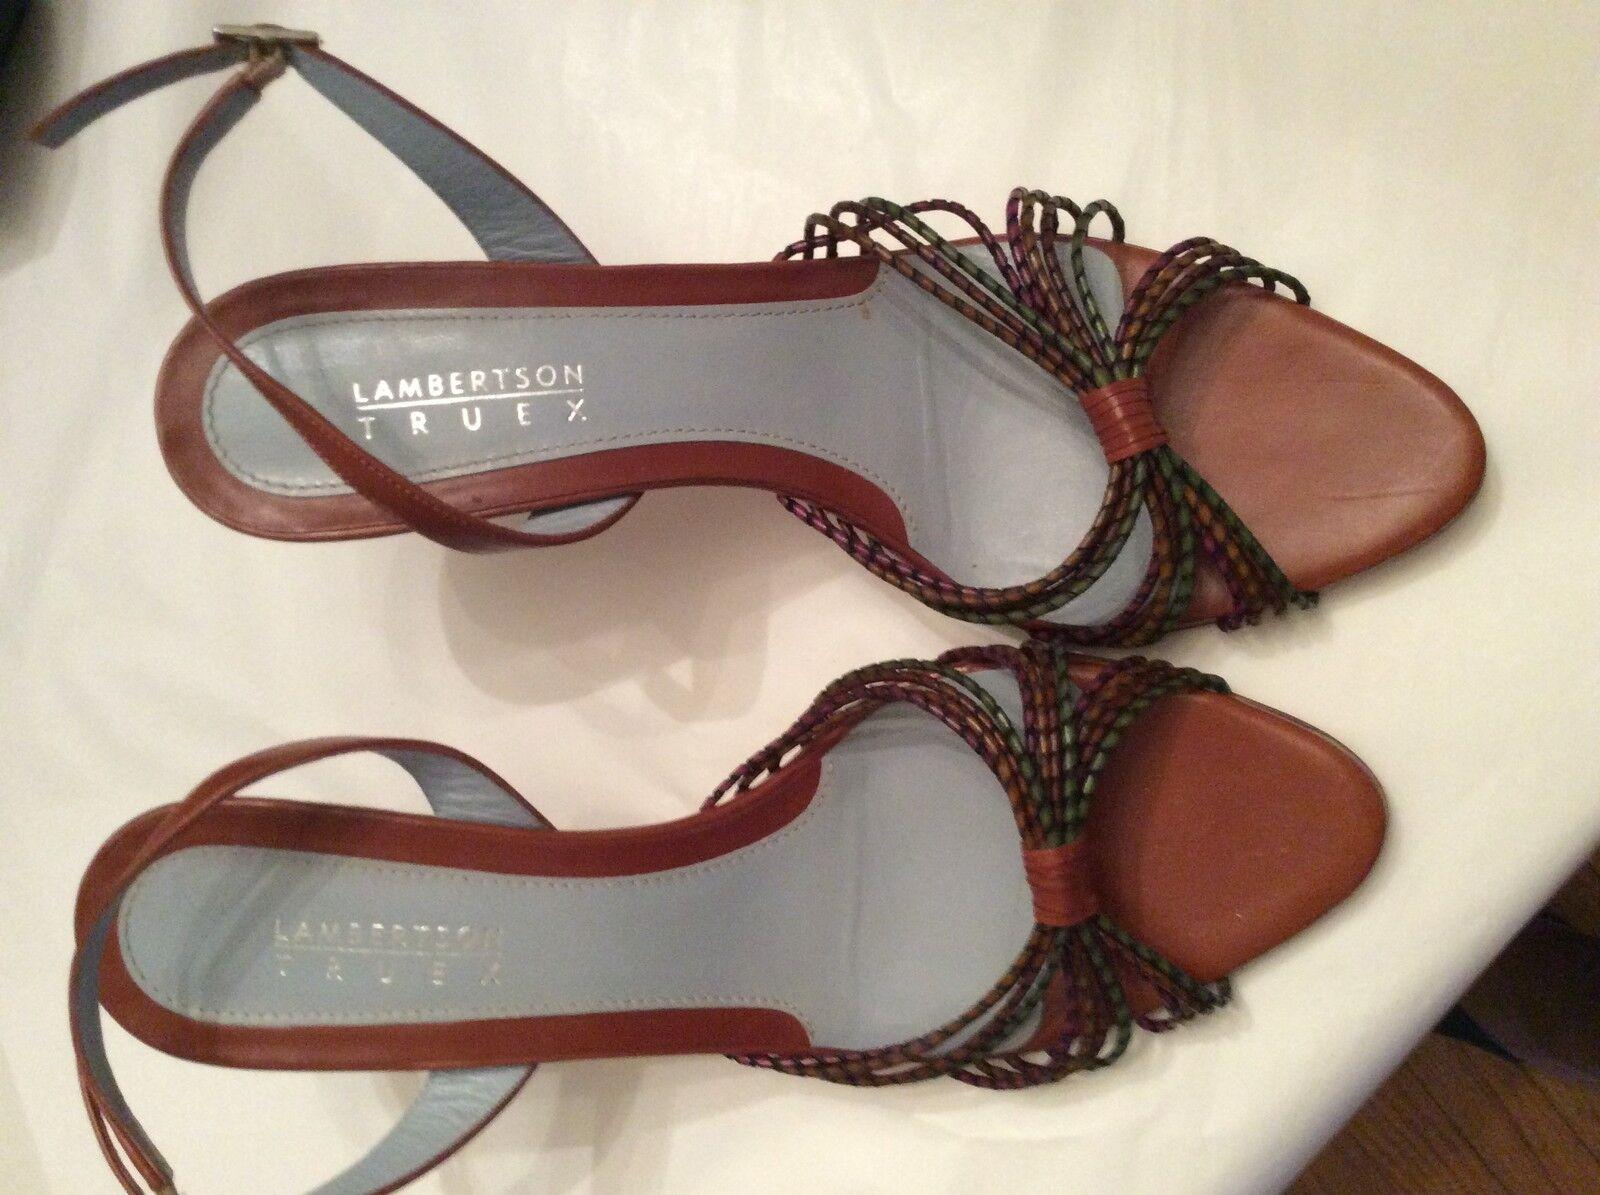 EXCELLENT CONDITION Lambertson Truex Leather 9 Sandals - US 9 Leather 766e01